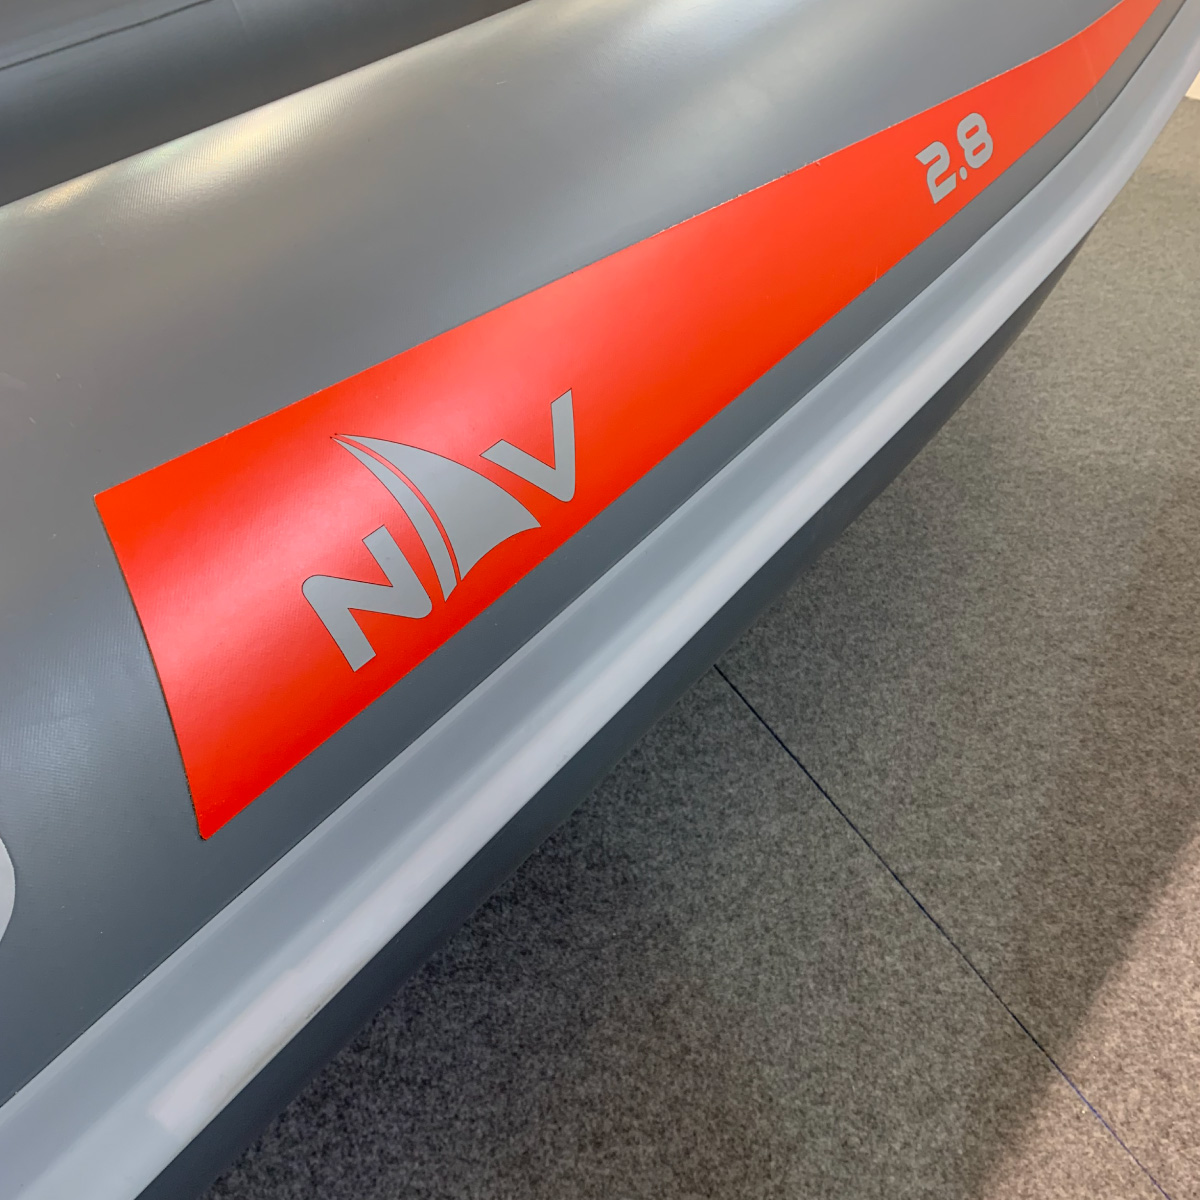 Tender Flat 2.8 - NV Style